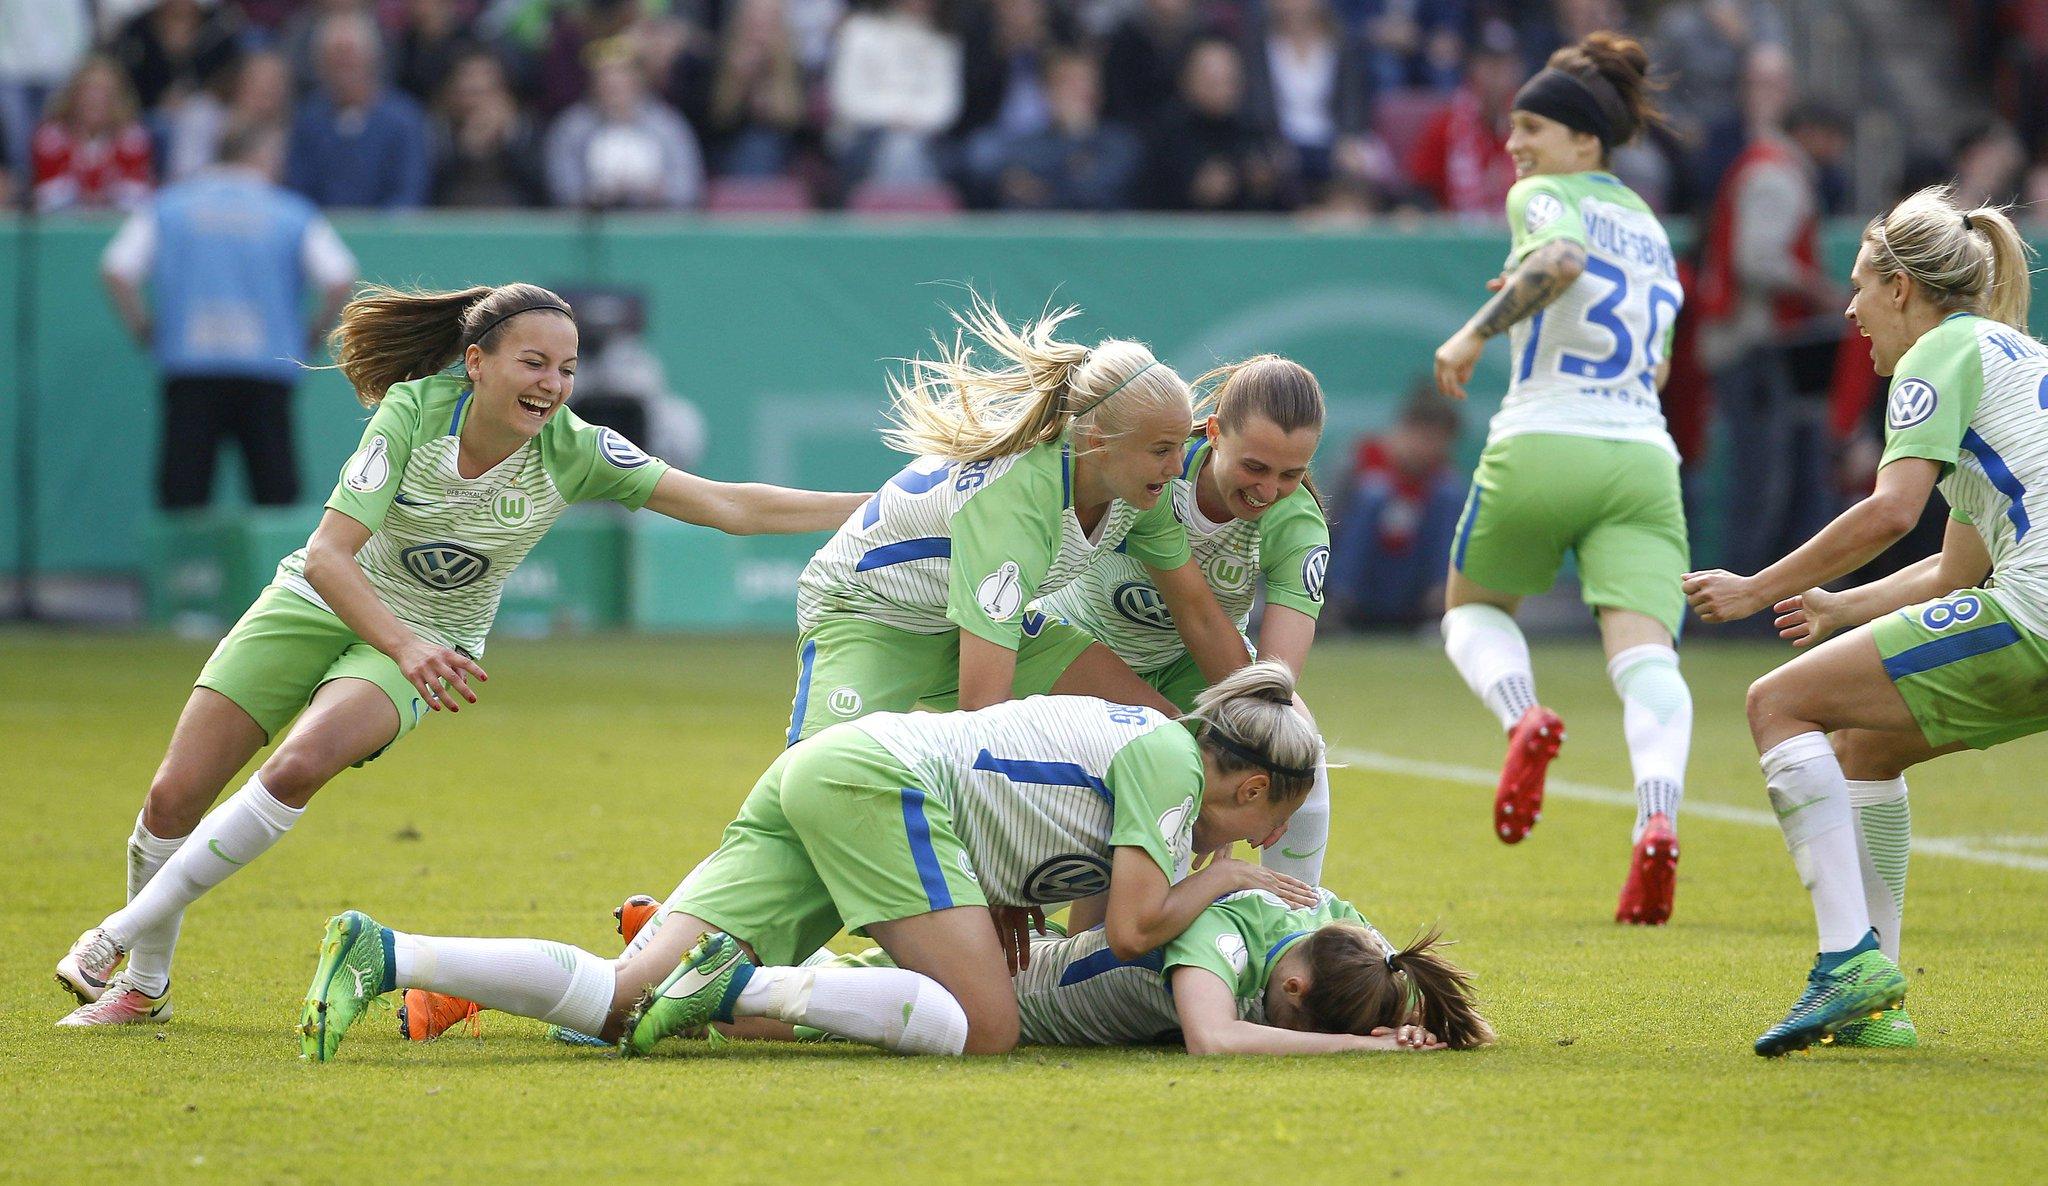 Dfb Frauenfussball